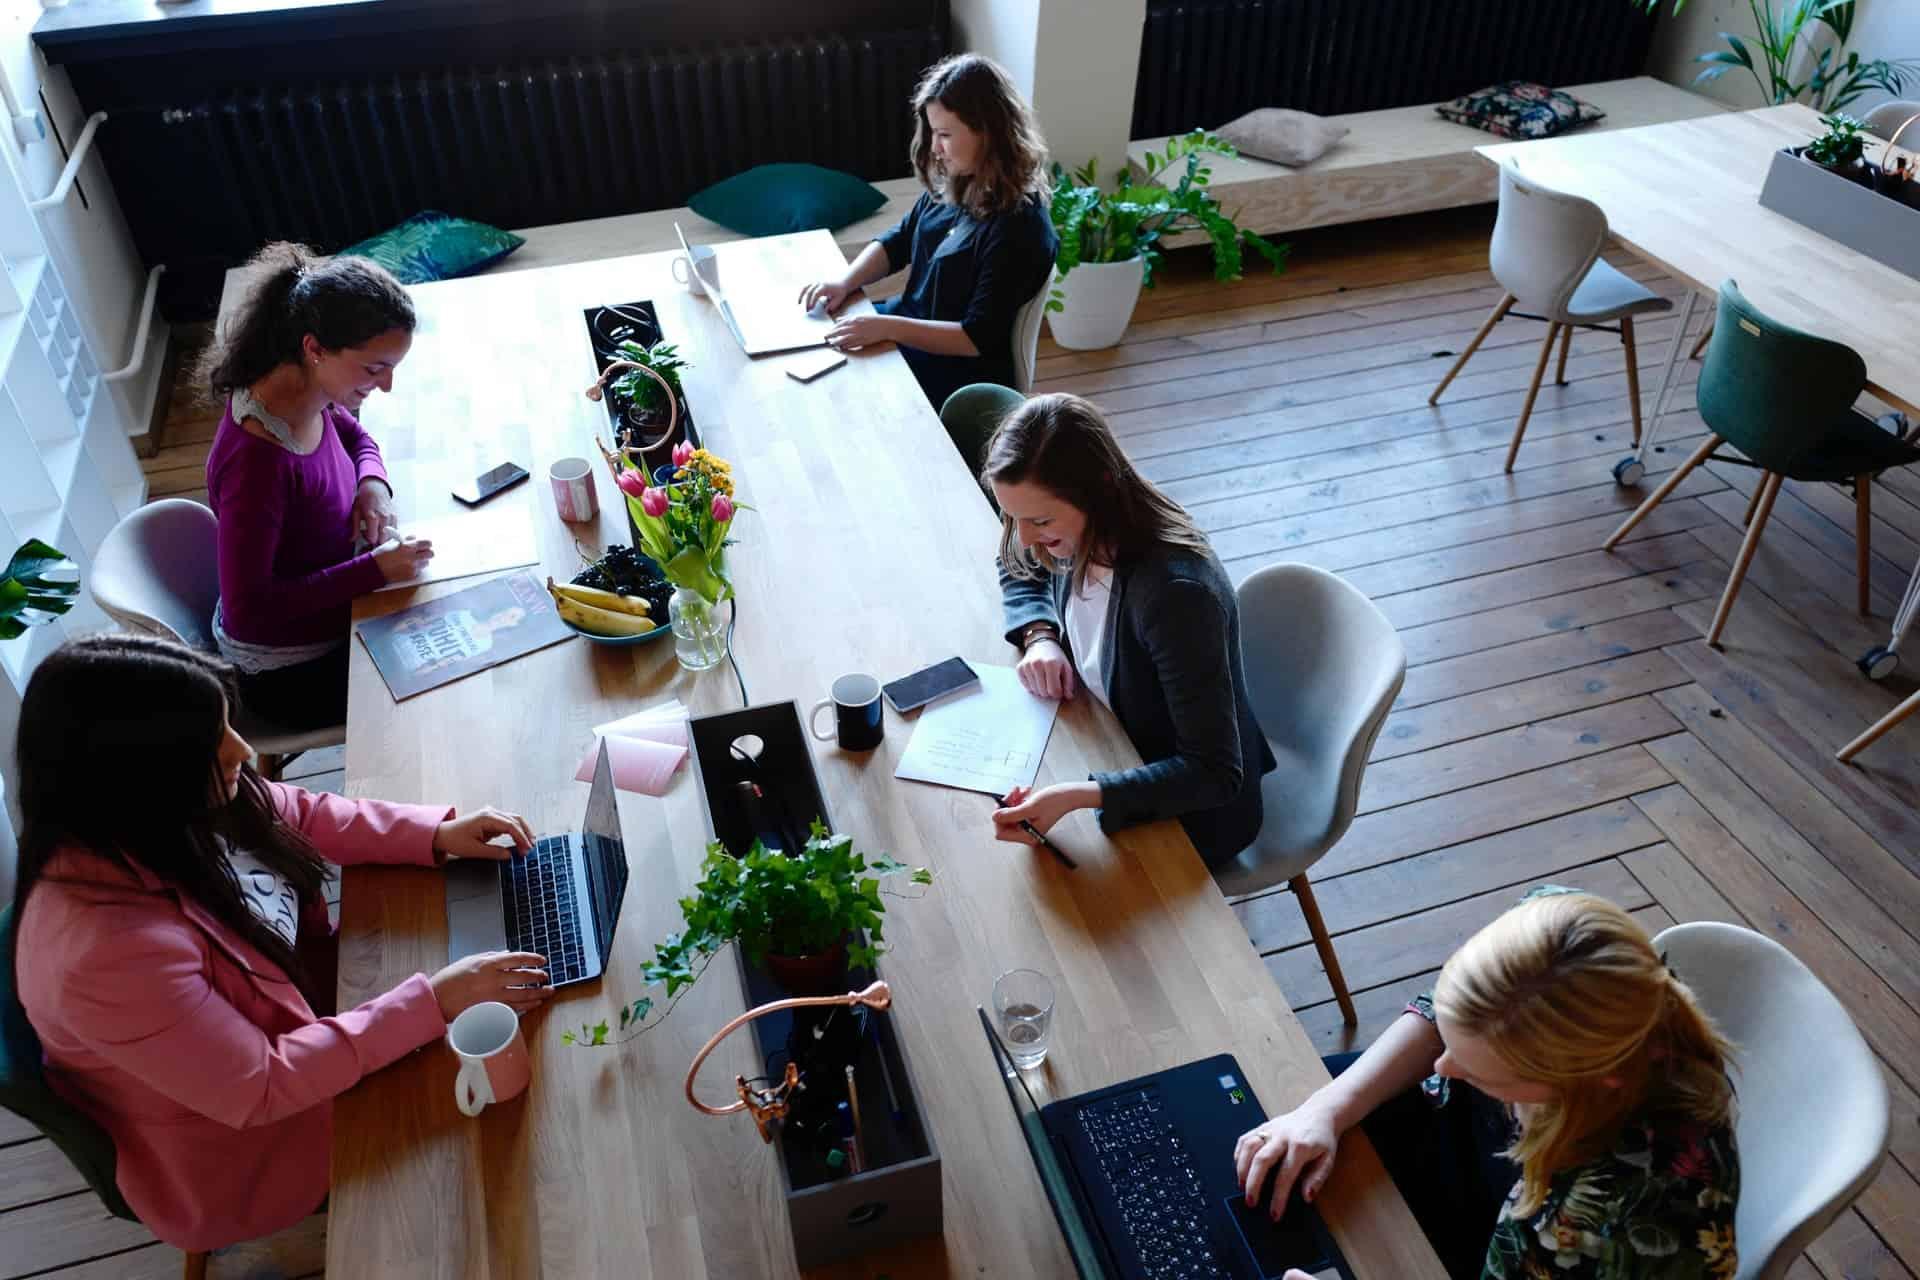 Women having meeting